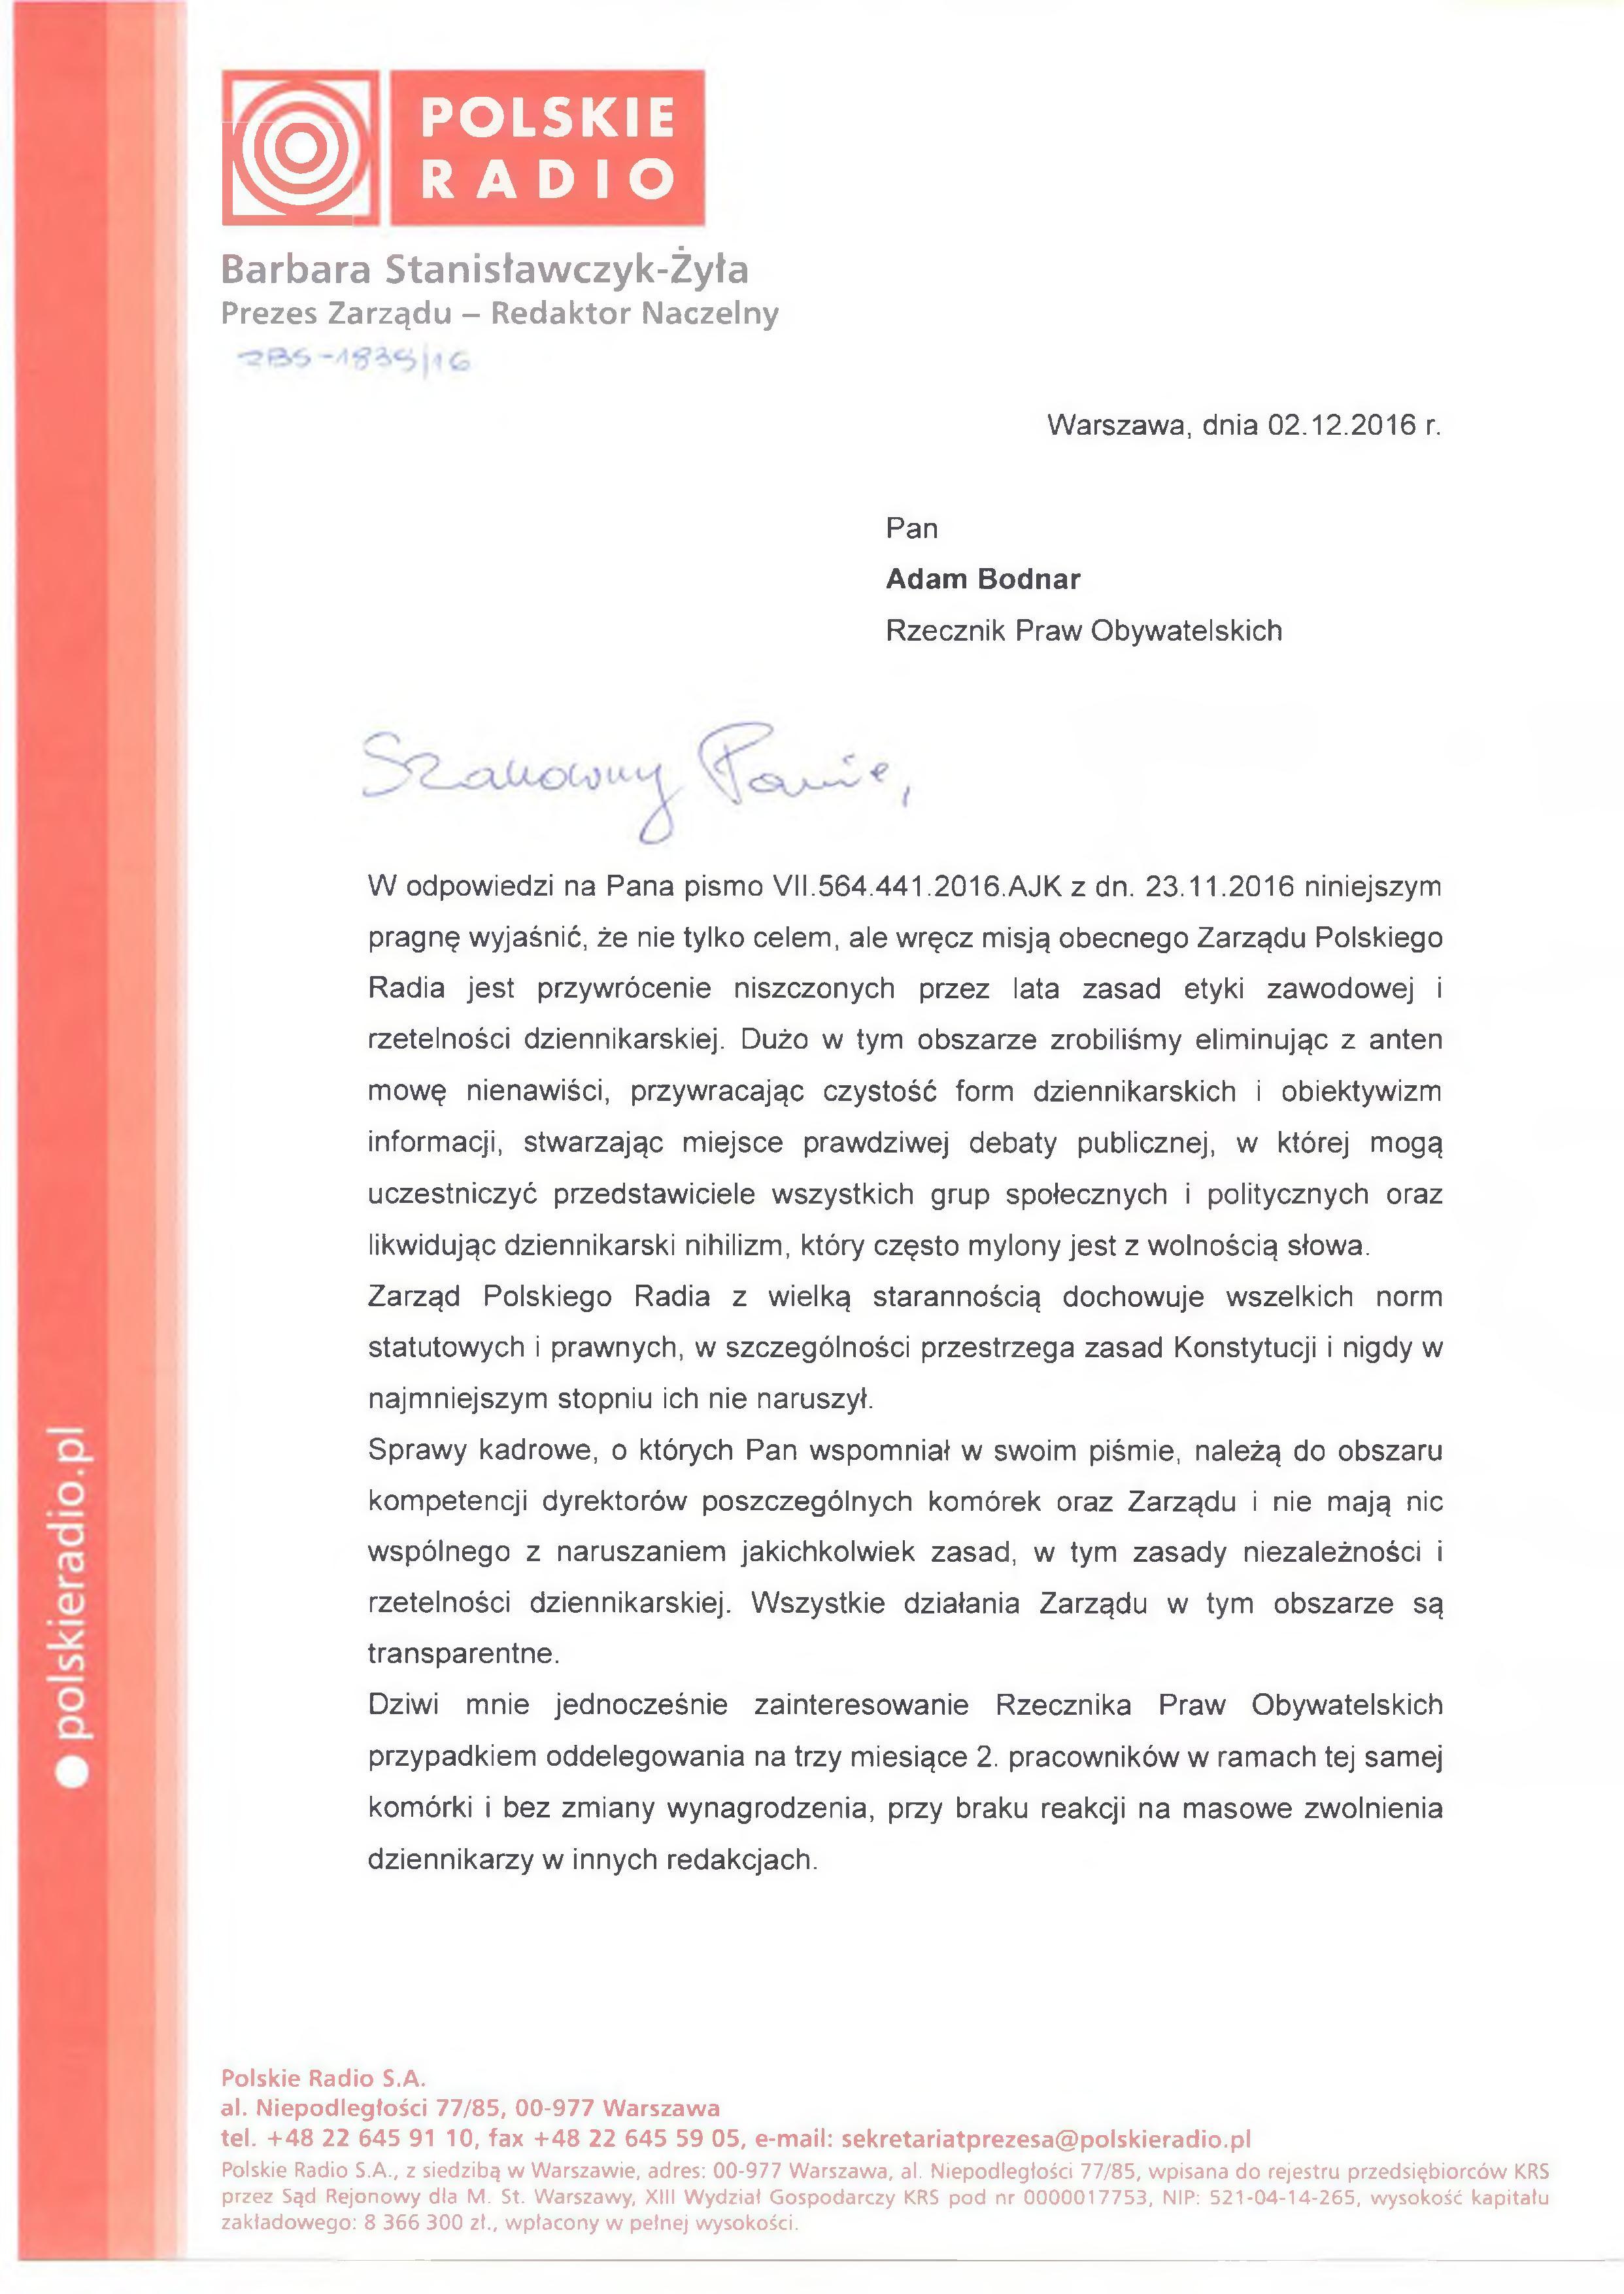 zbs-1839_rpo_adam-bodnar_2-12-2016-odp-pr-2-12-16_0-page-001